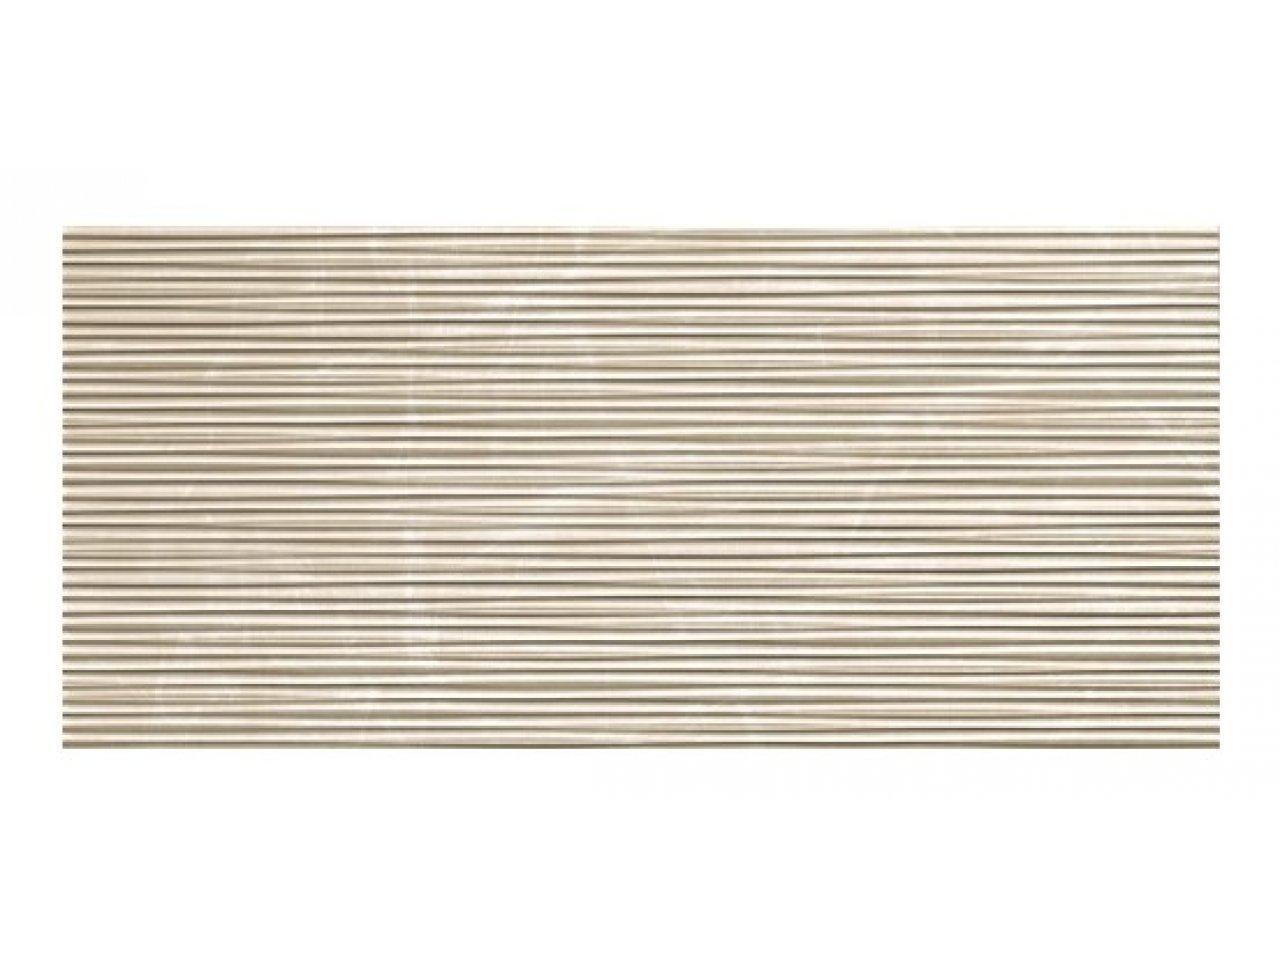 Настенная плитка FAP Roma Diamond 110 Line Beige Duna Brillante 110 x 50 см, Арт. fNHI